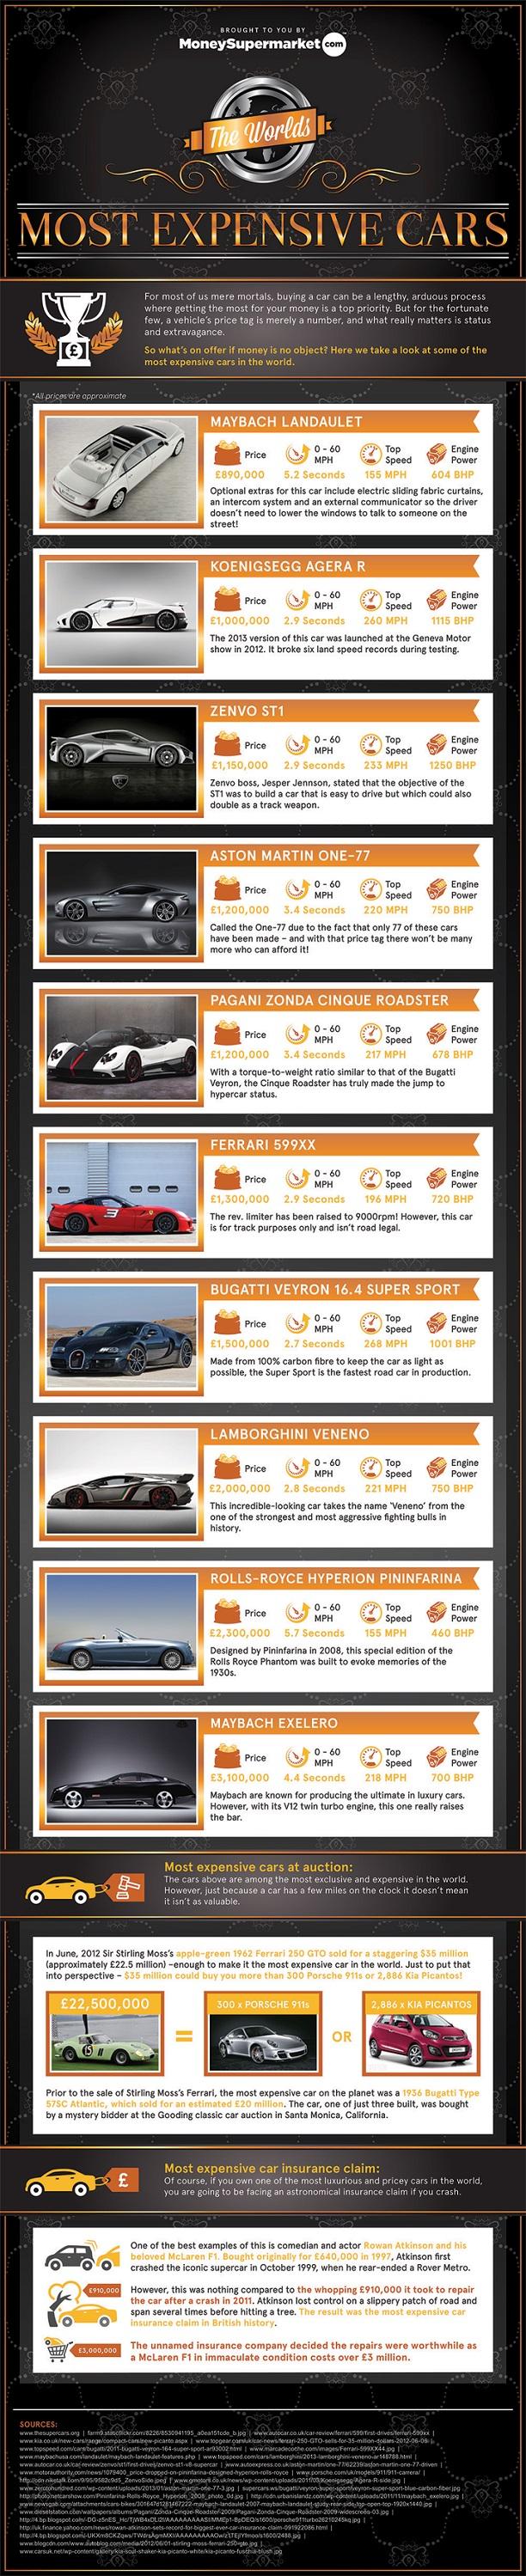 Million Dollar Cars-Infographic